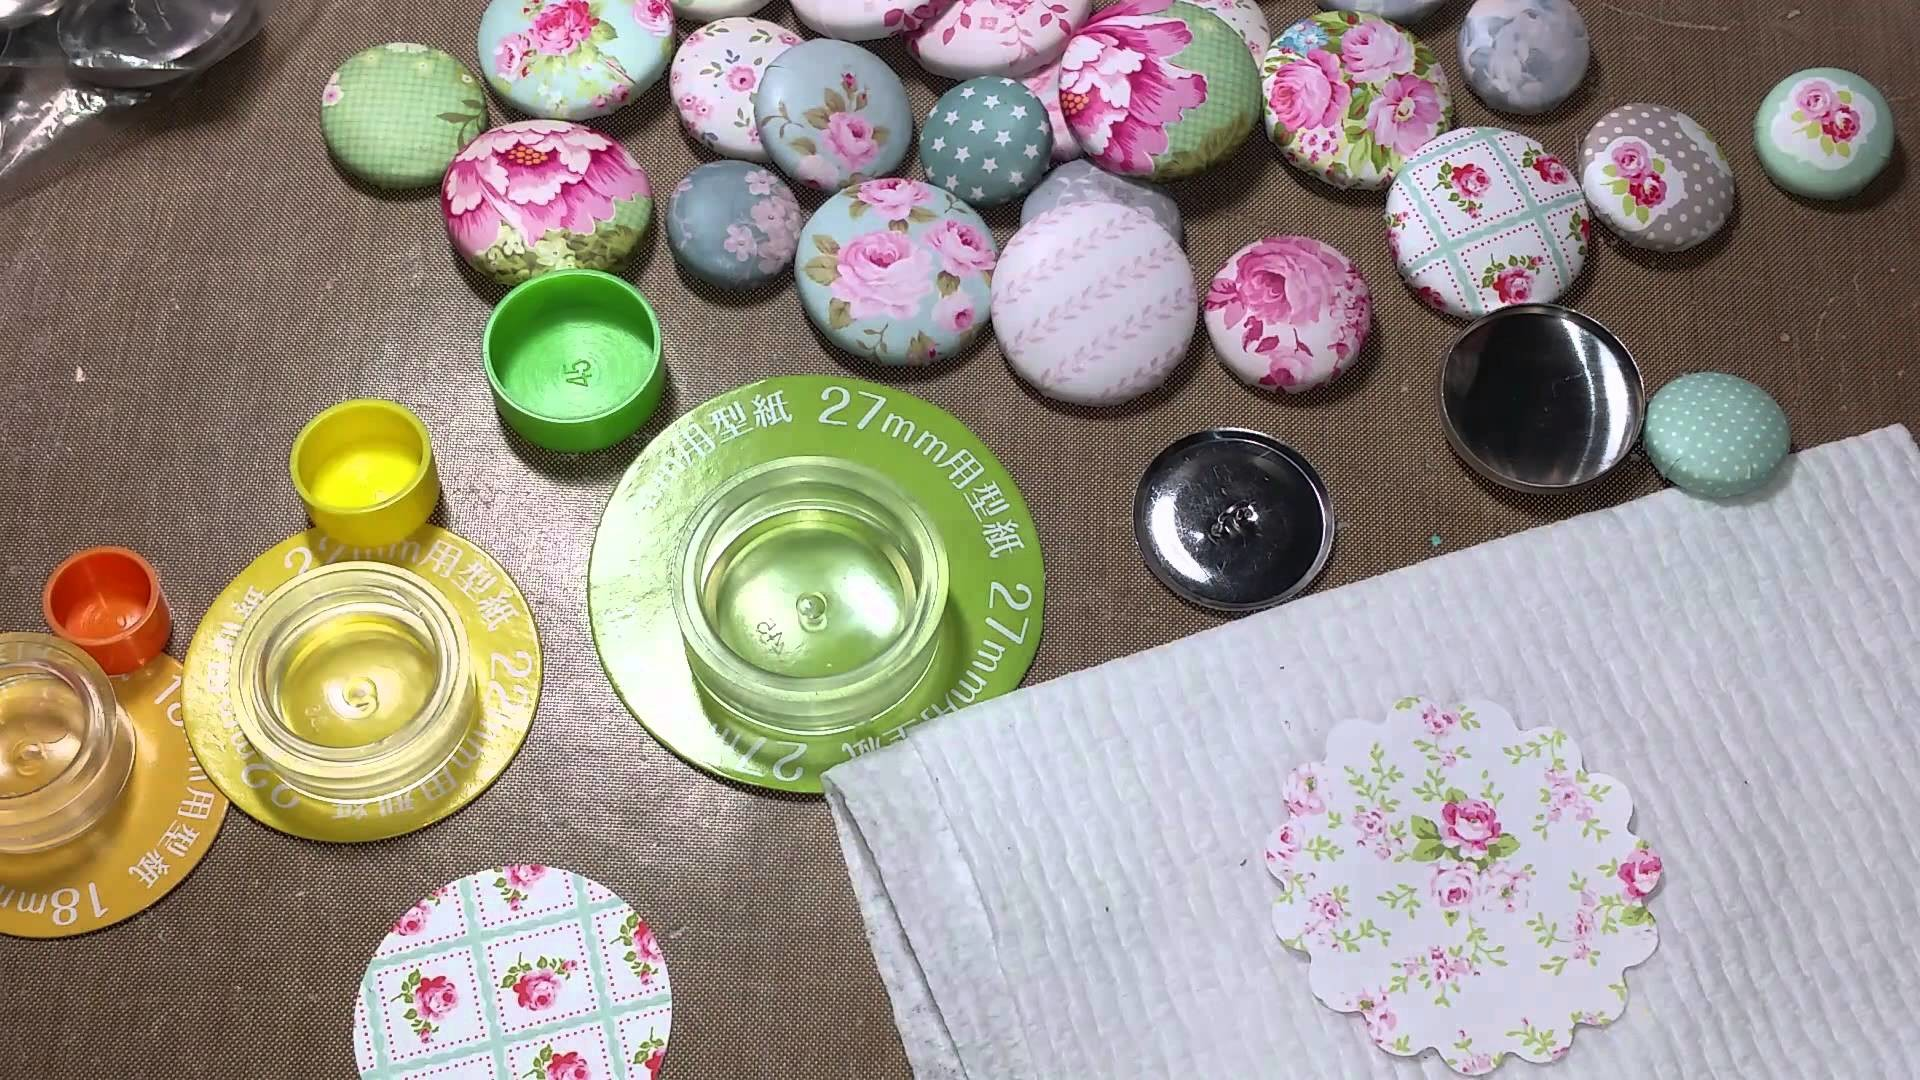 TUTORIAL - Button maker using paper